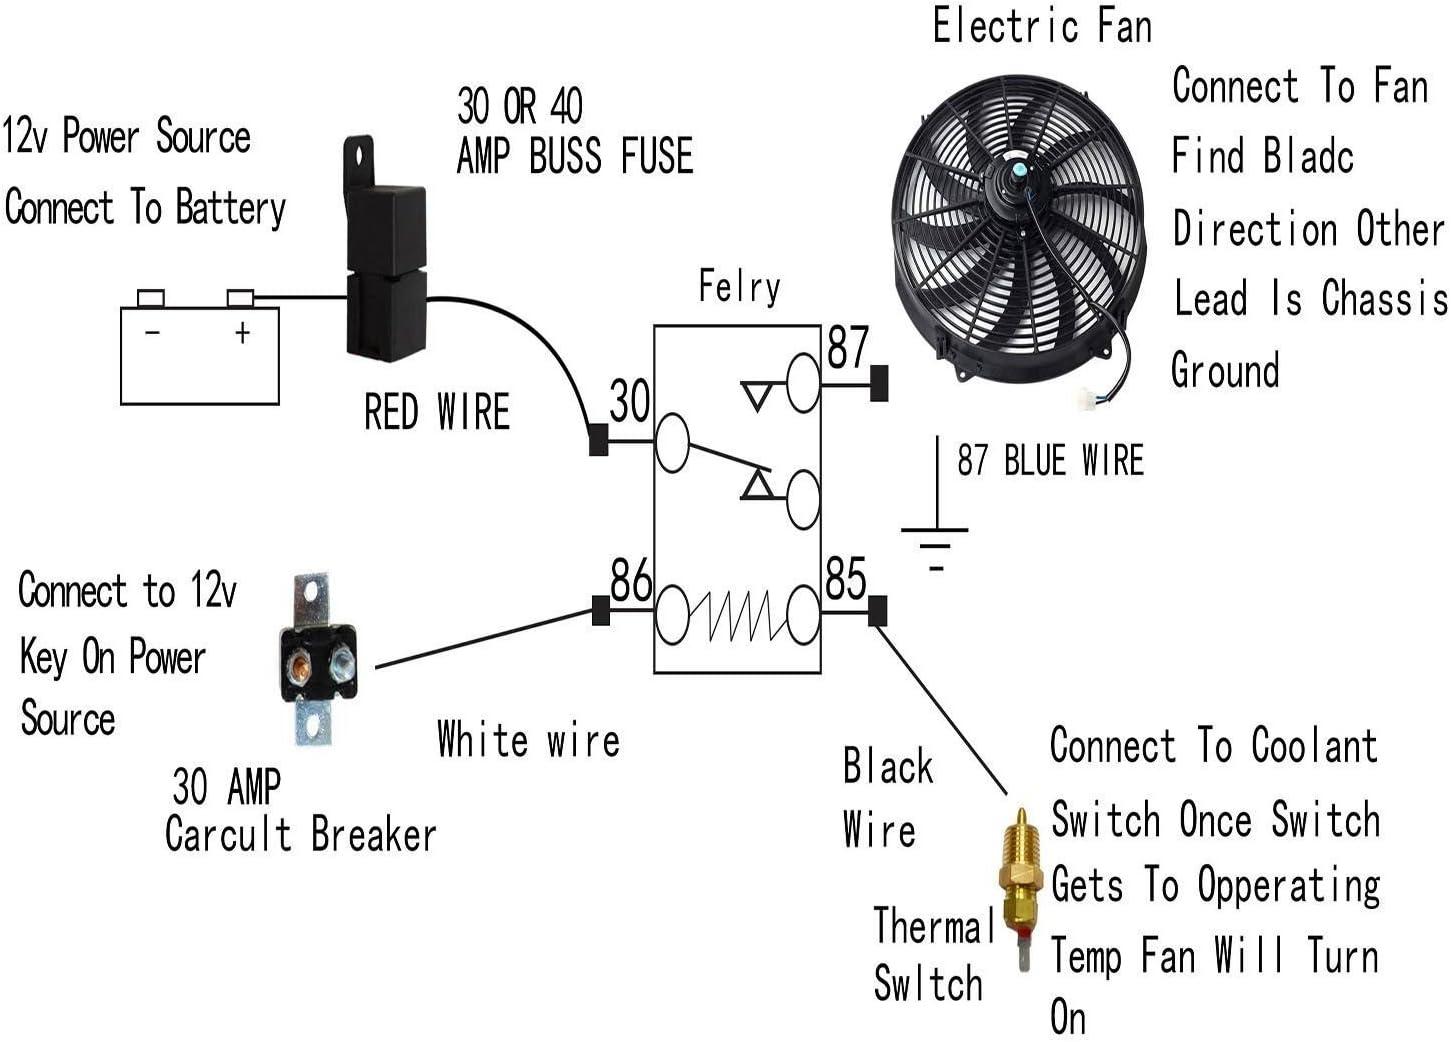 Radiator Fan Electric Fan Relay Wiring Diagram from m.media-amazon.com